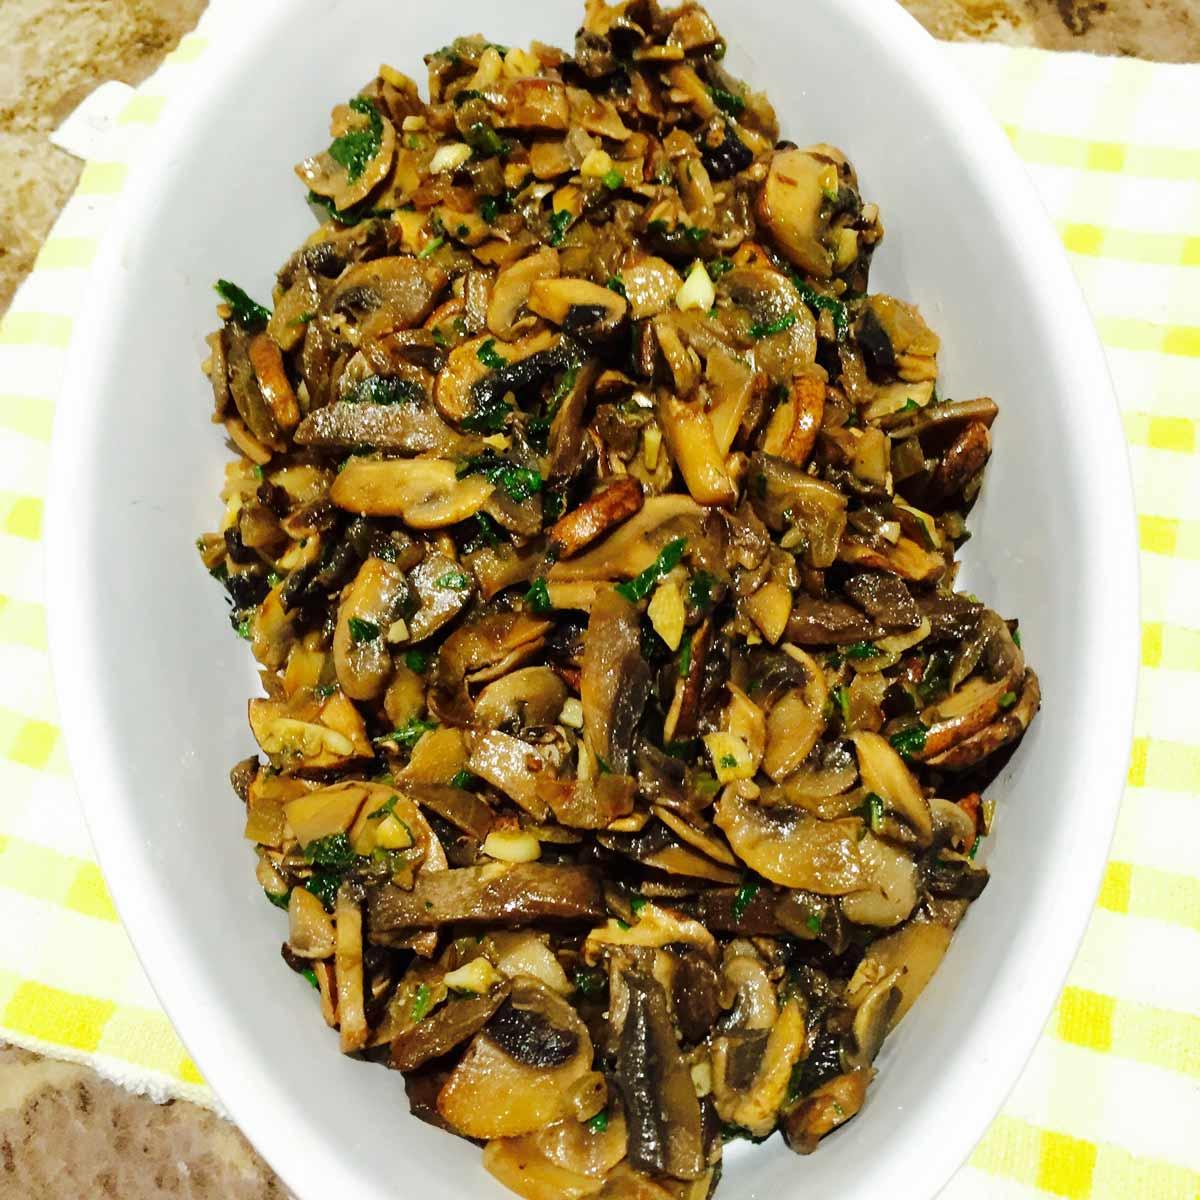 A bowl of chunky garlic mushrooms